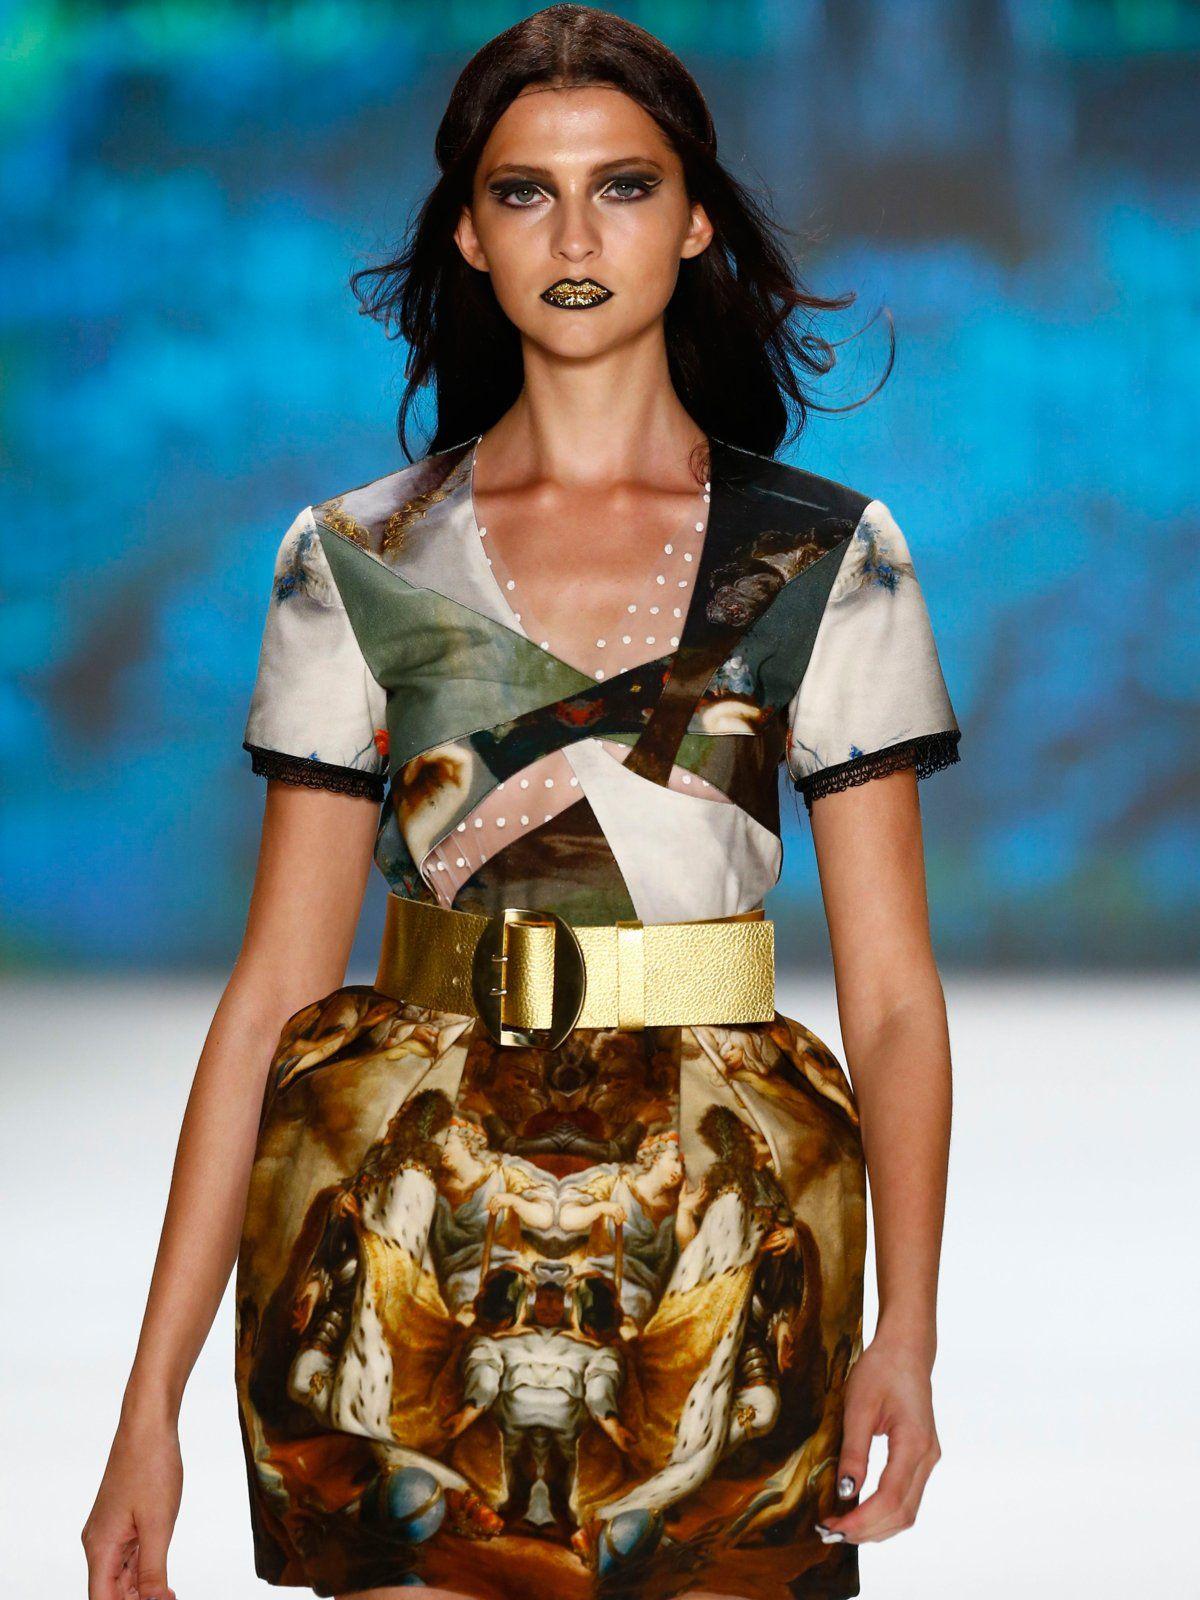 Fata Hasanovic for Rebekka Ruetz photo: Getty Images